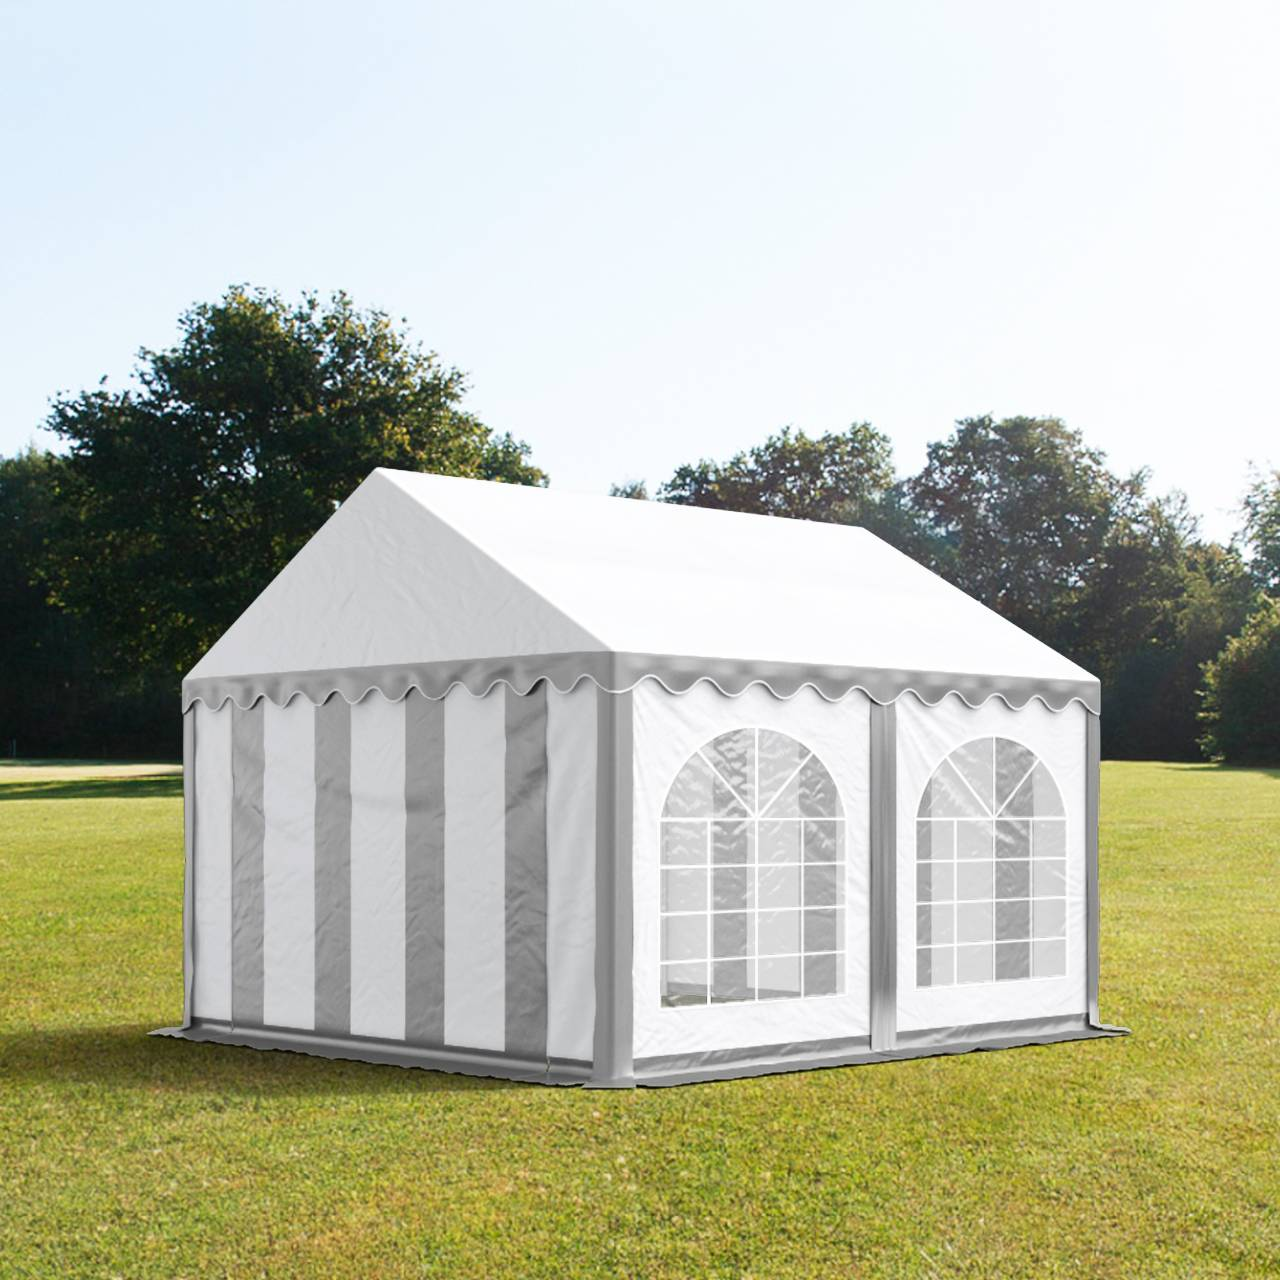 tendapro.it Tendone 4x4m PVC bianco-grigio Gazebo per Feste e Giardino